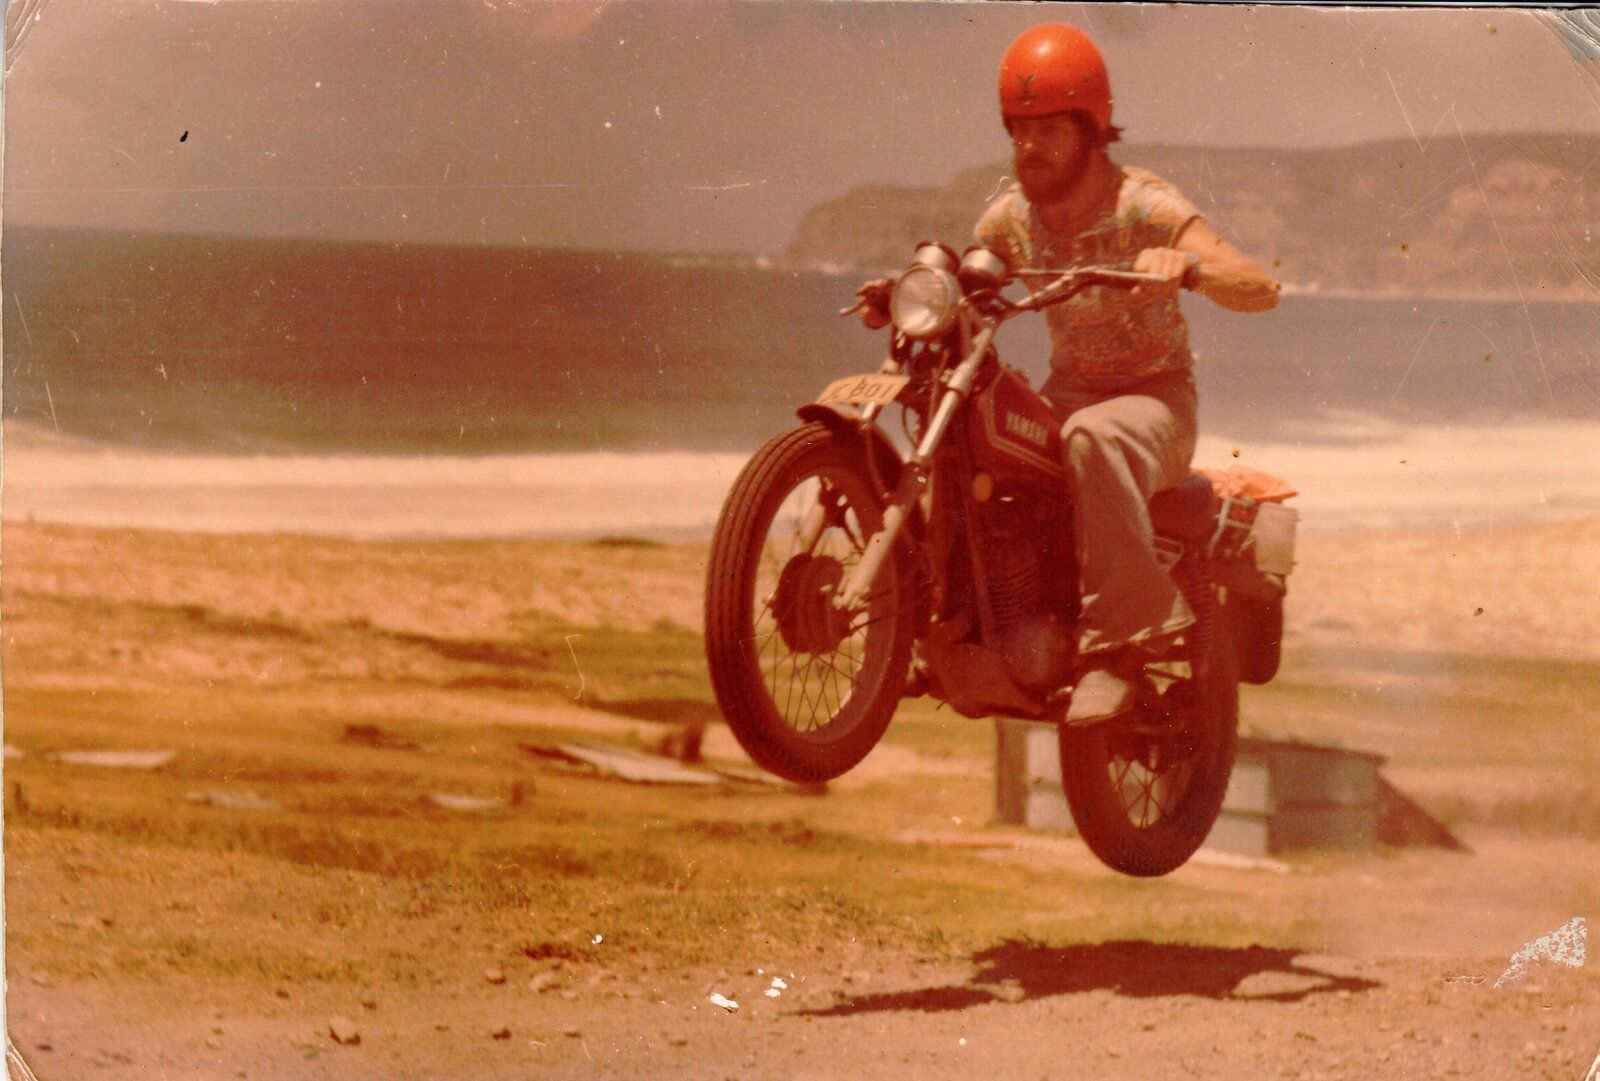 Ian on Yamaha 125 1973.jpeg